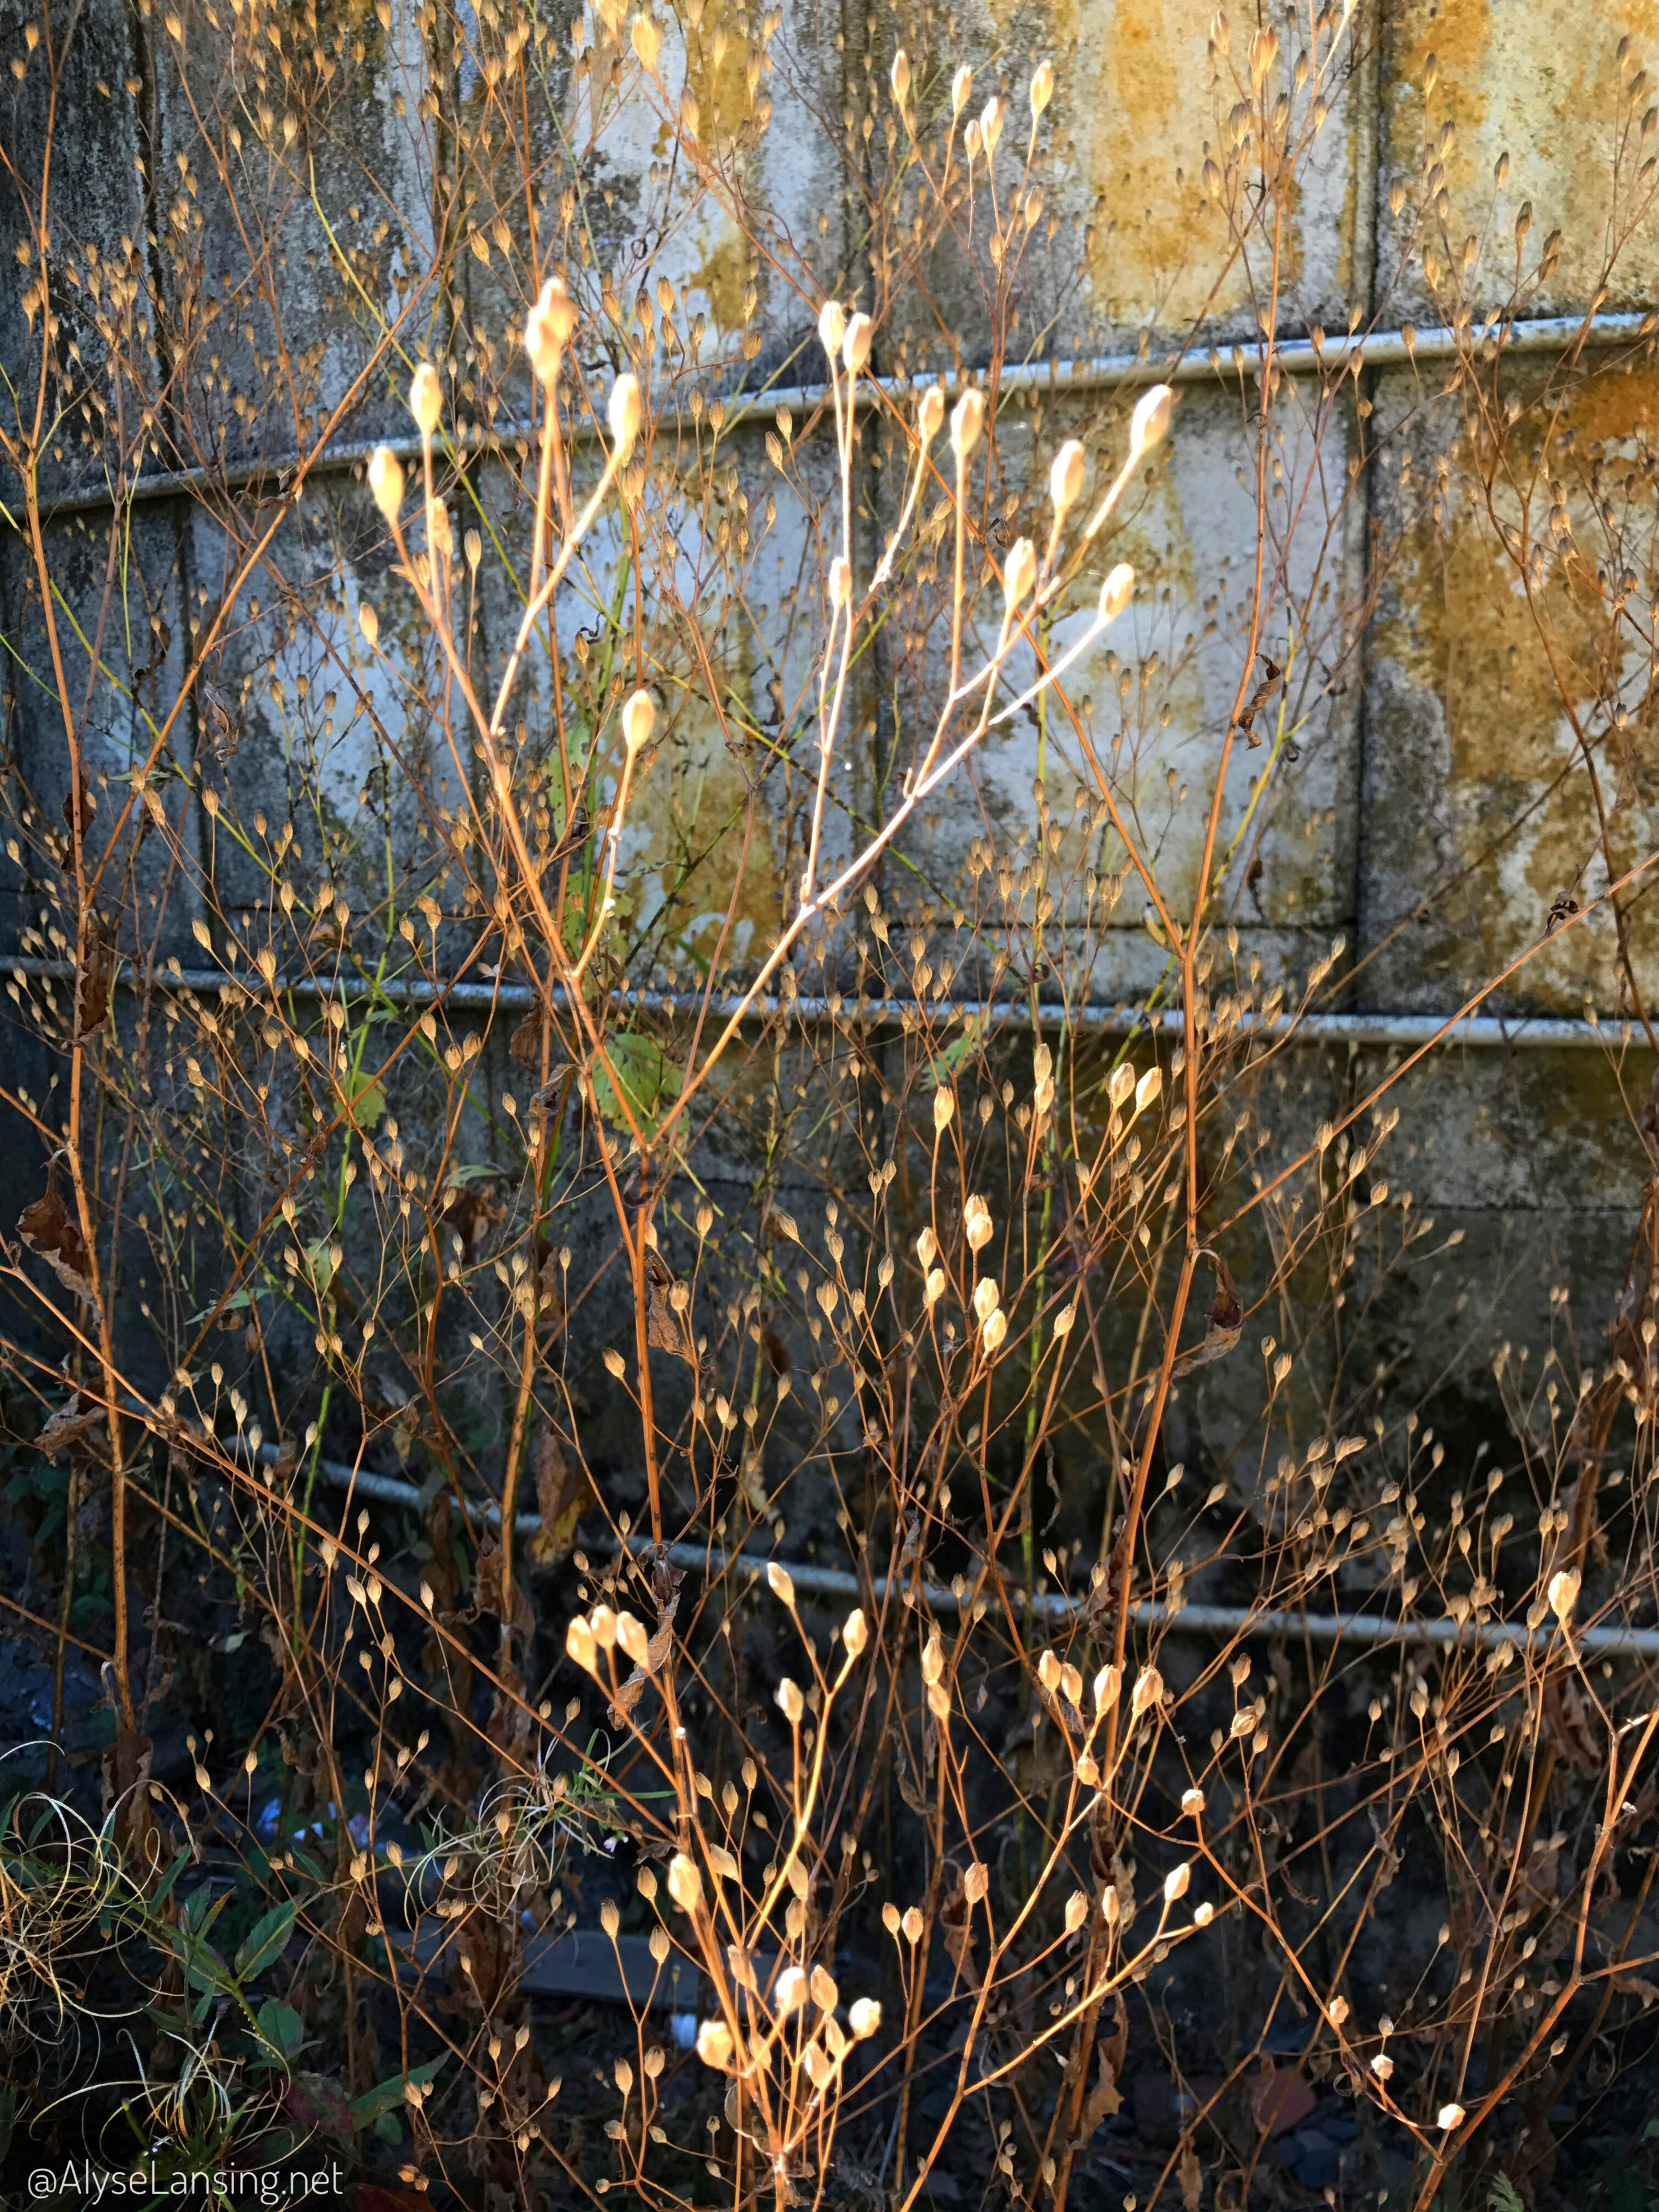 weeds_and_silo_AlyseLansing2017_16